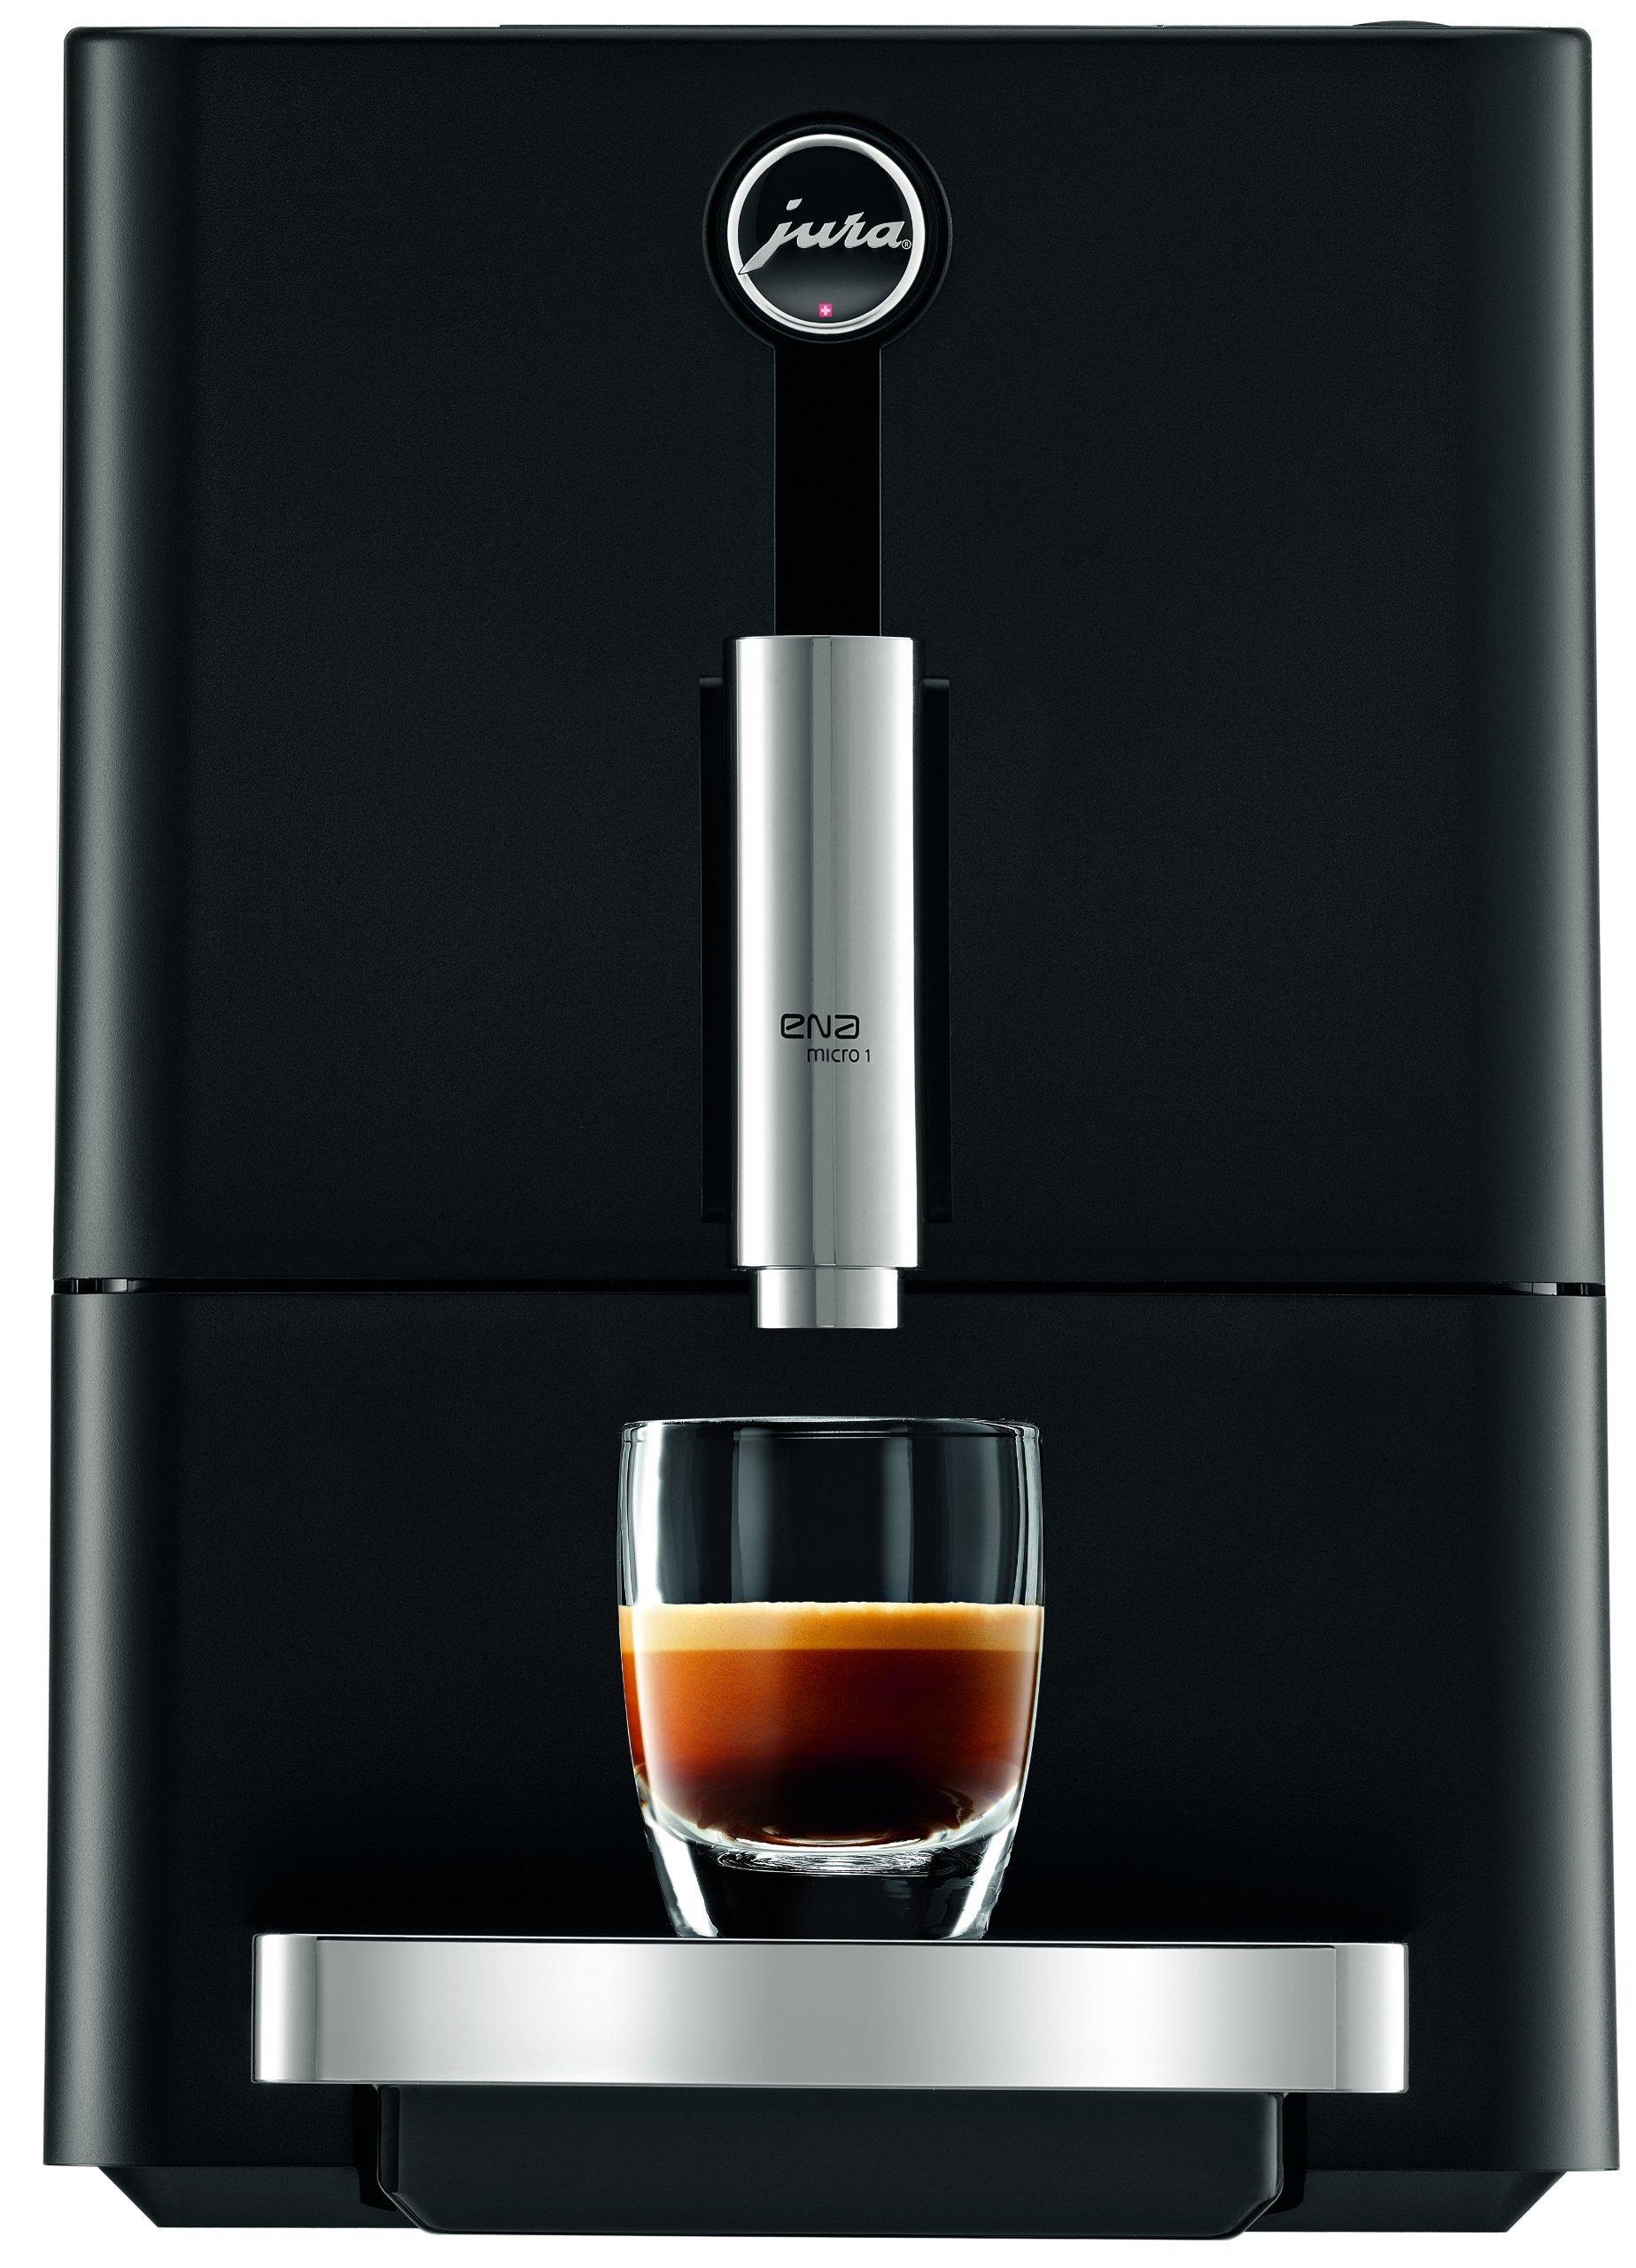 Jura 13626 Ena Micro 1 Automatic Coffee Machine, Micro Black (Renewed)